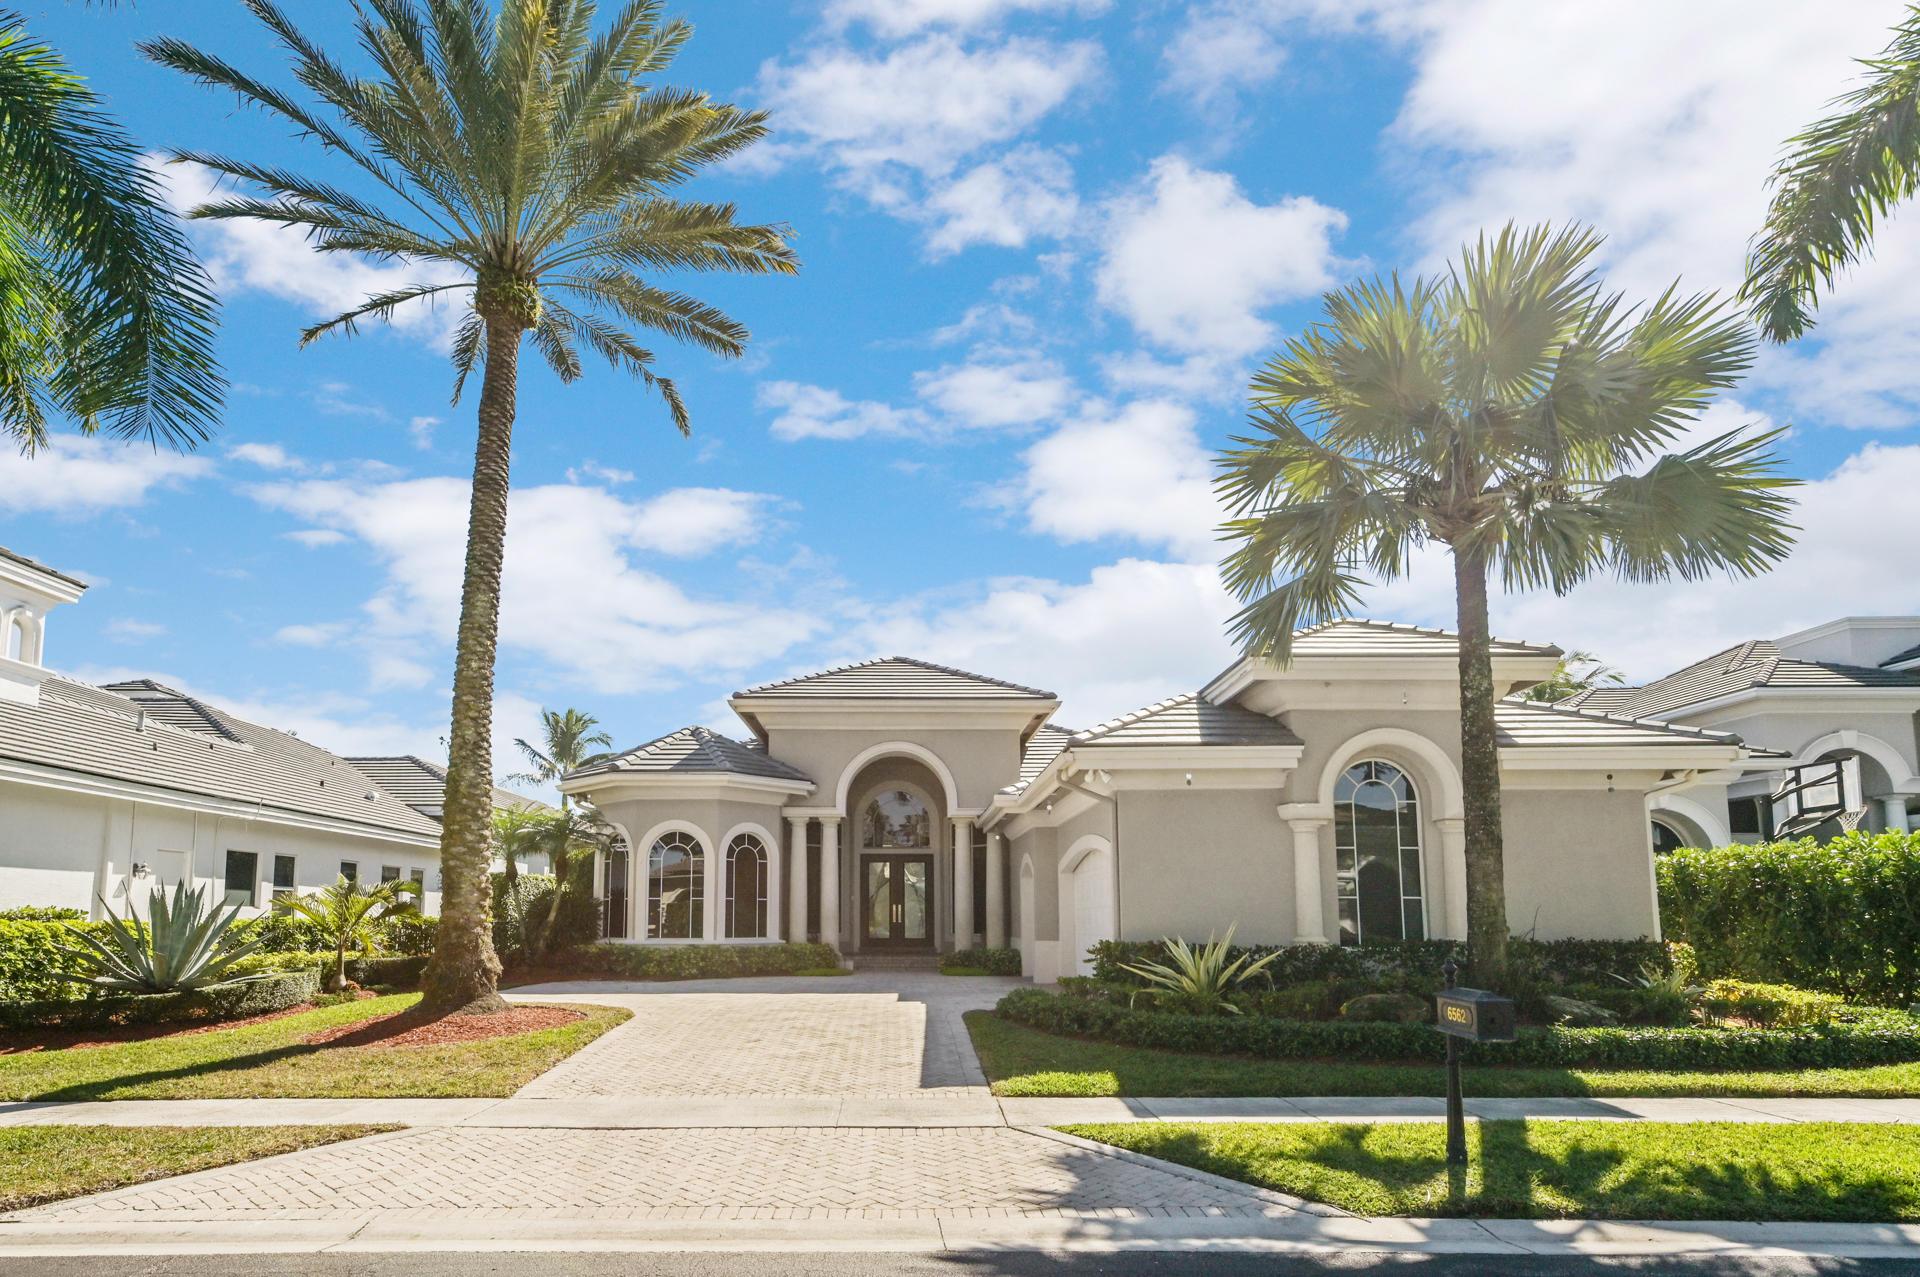 Photo of 6562 Landings Court, Boca Raton, FL 33496